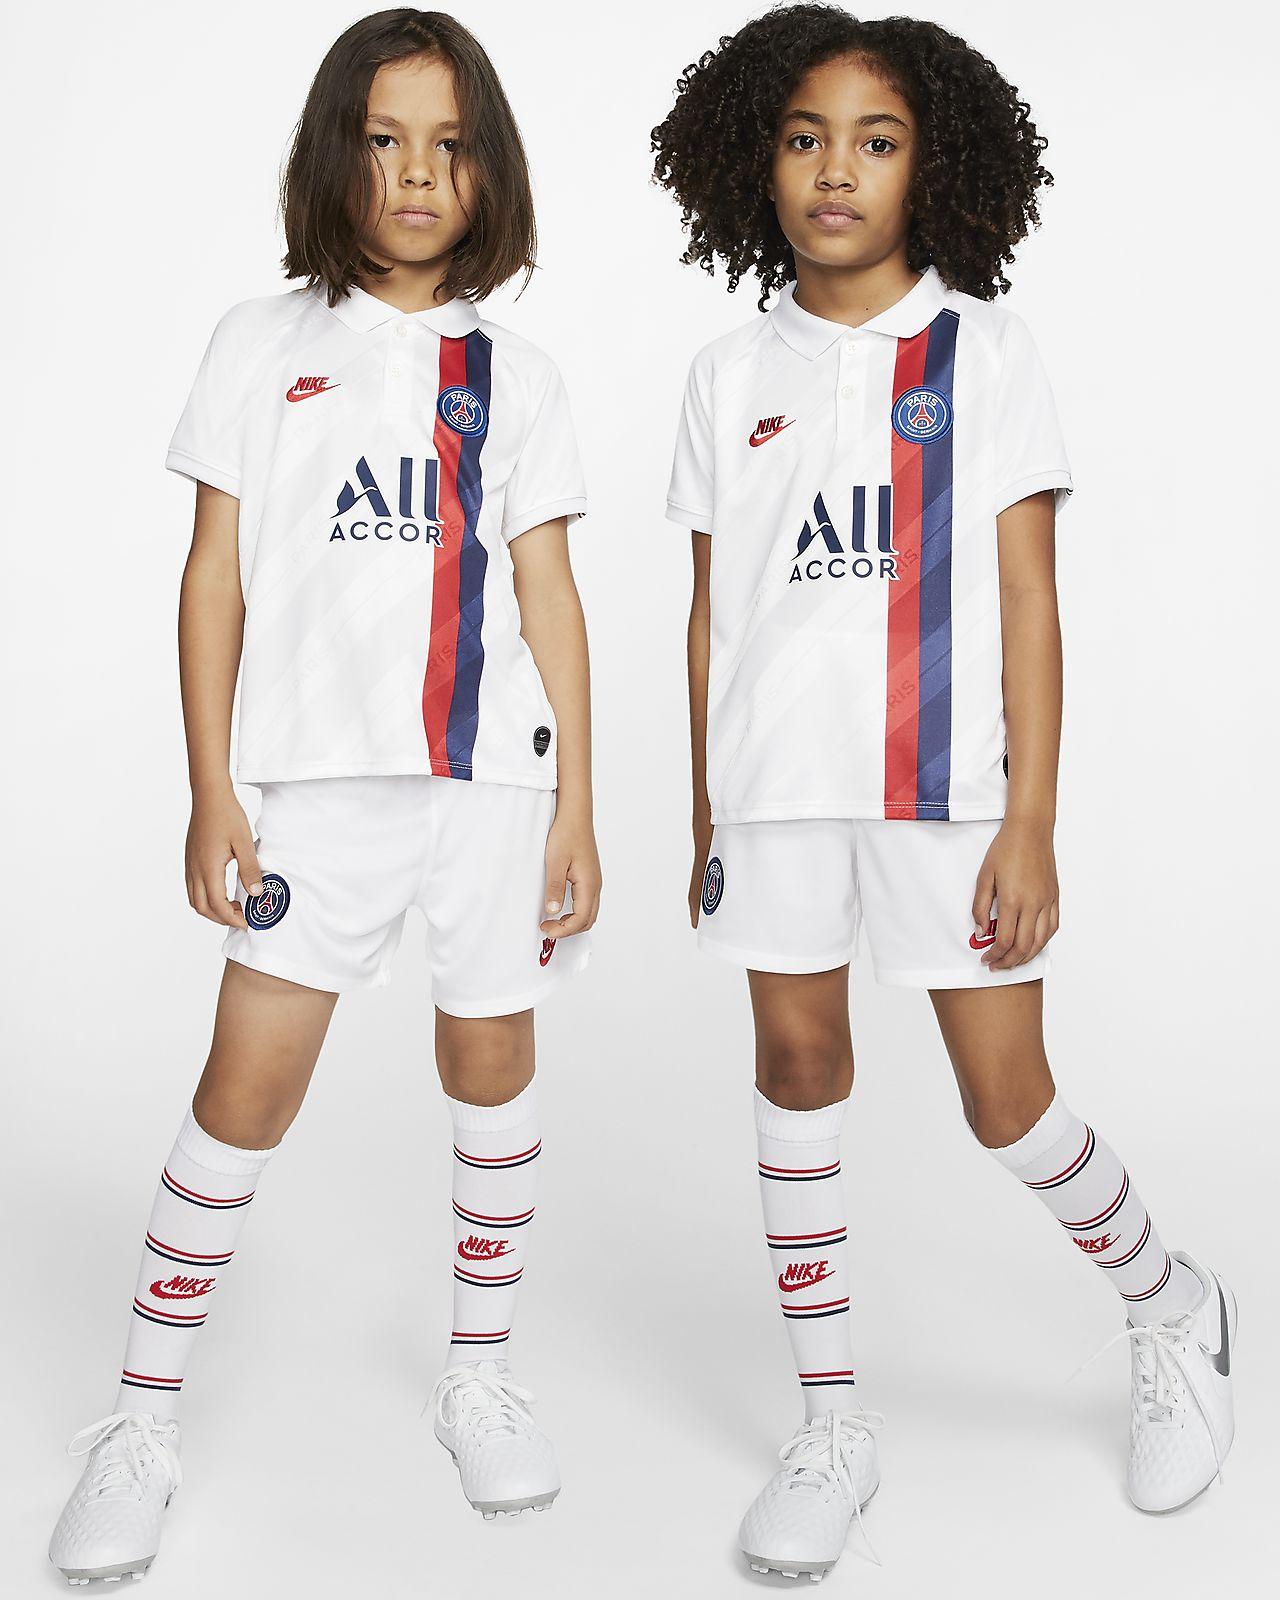 Paris Saint-Germain 2019/20 Third Younger Kids' Football Kit